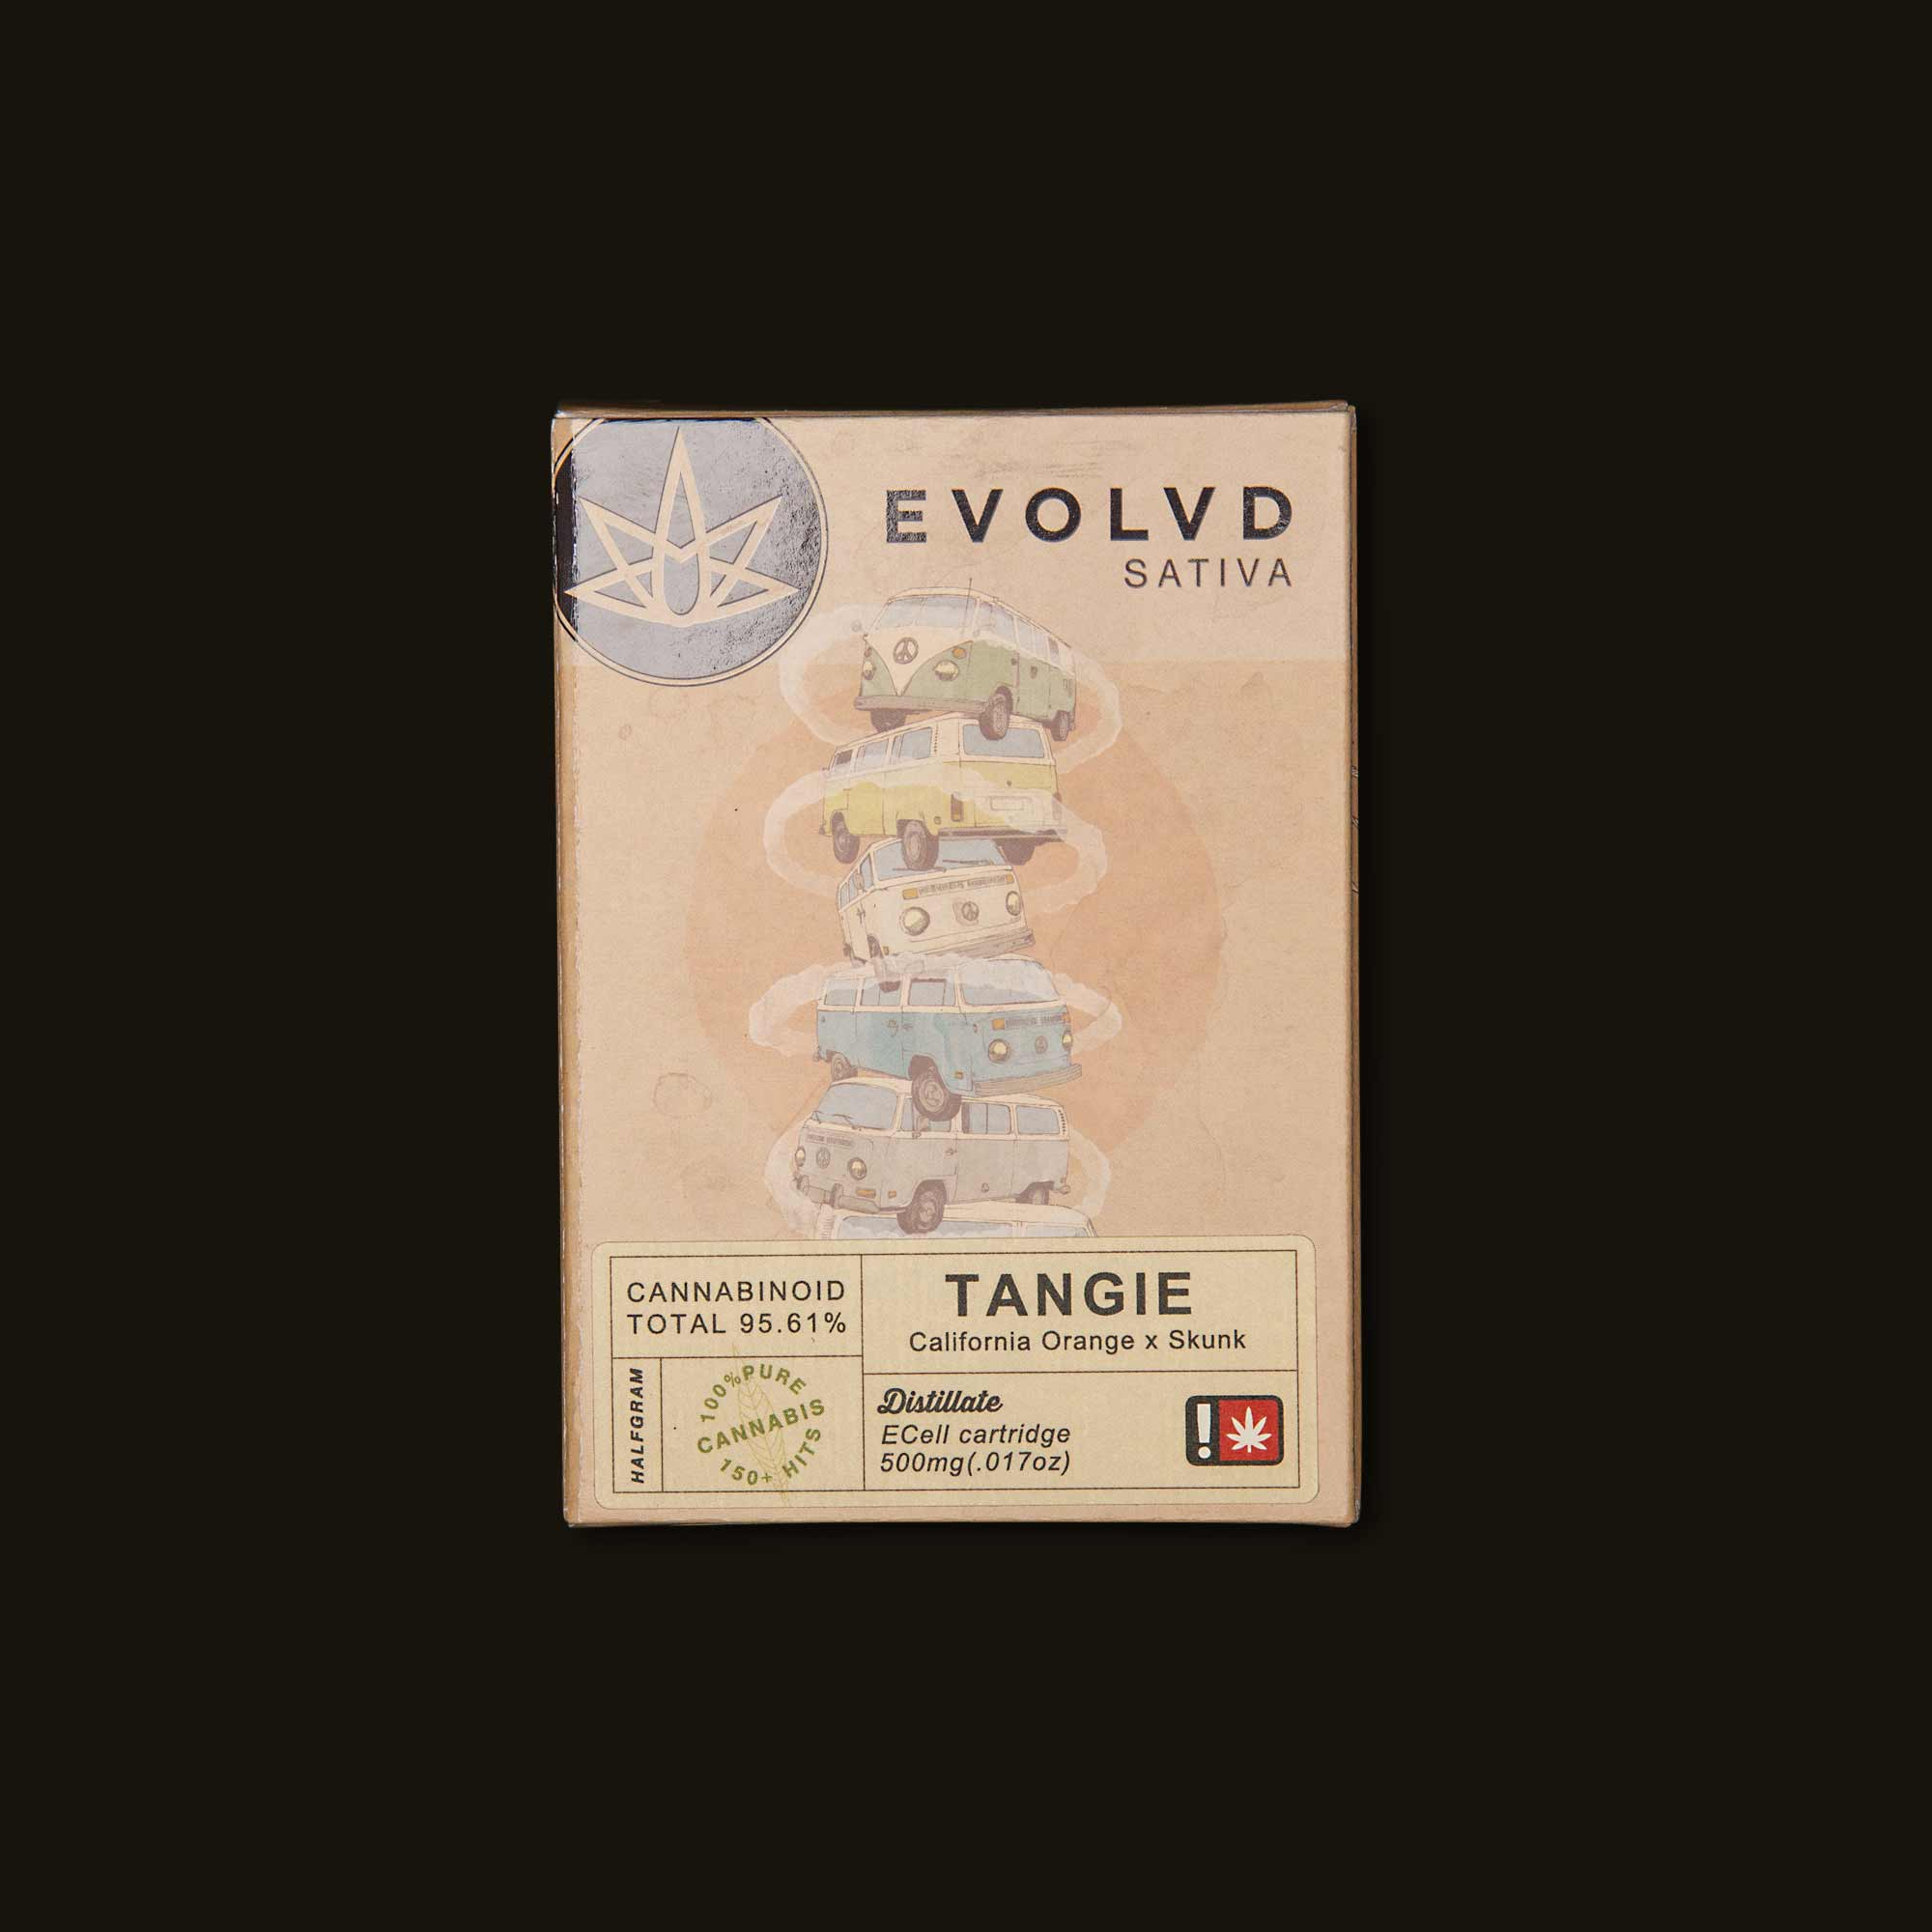 EVOLVD Tangie Cartridge